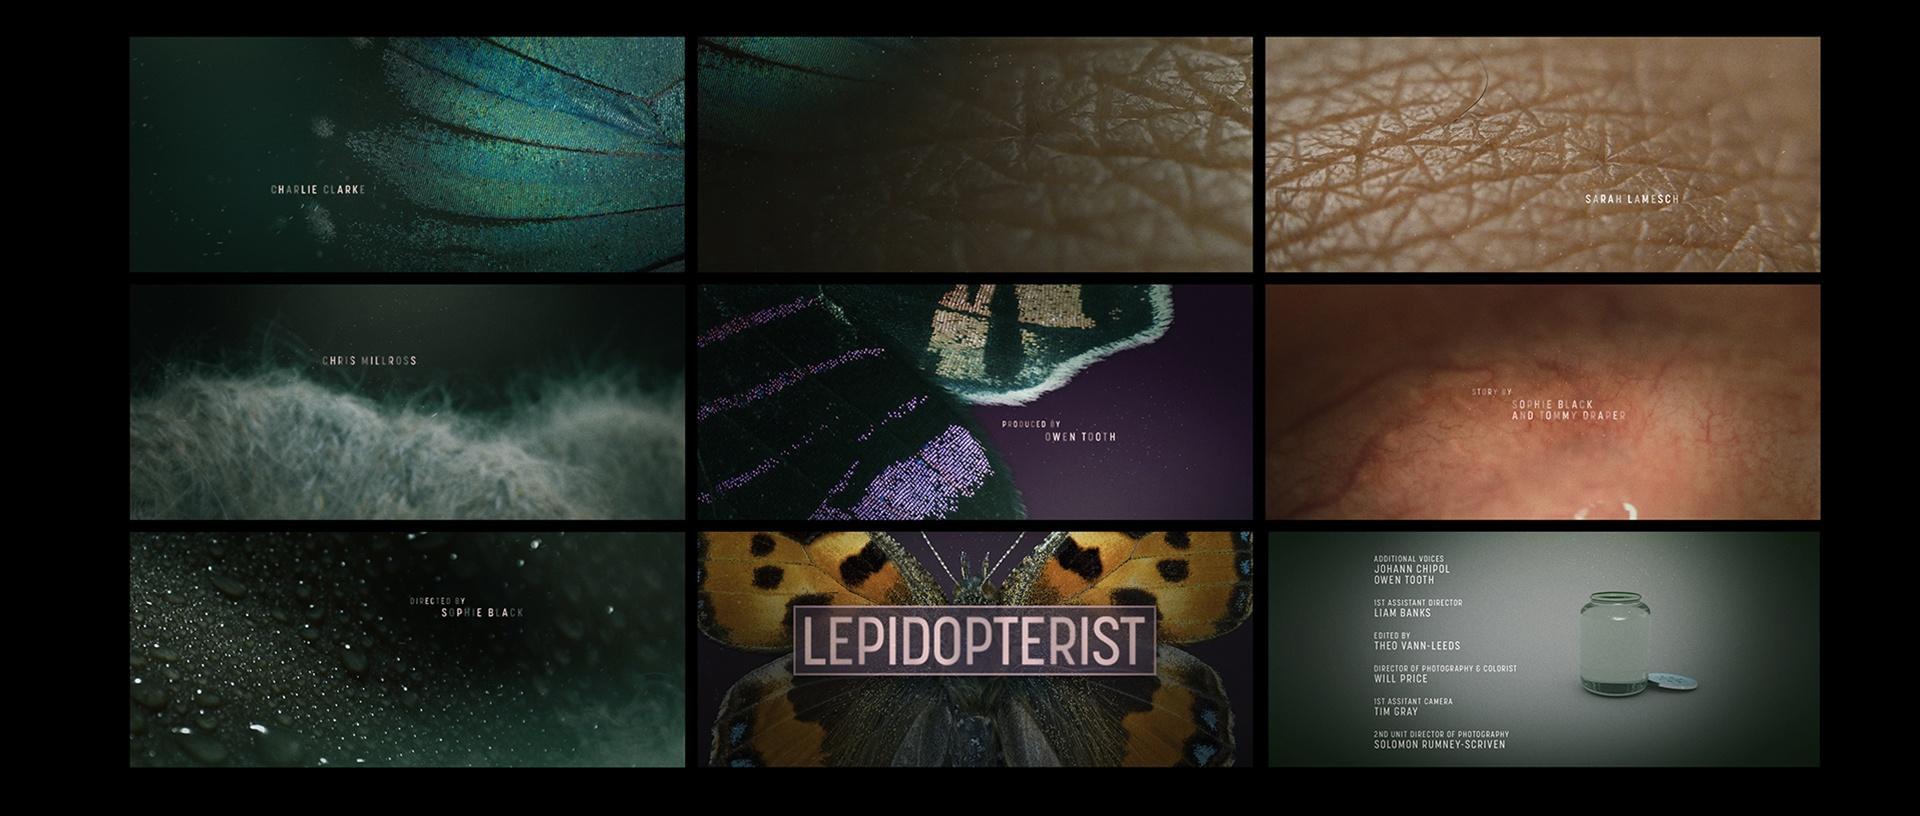 StyleFrames_LEPIDOPTERIST Main Titles_01